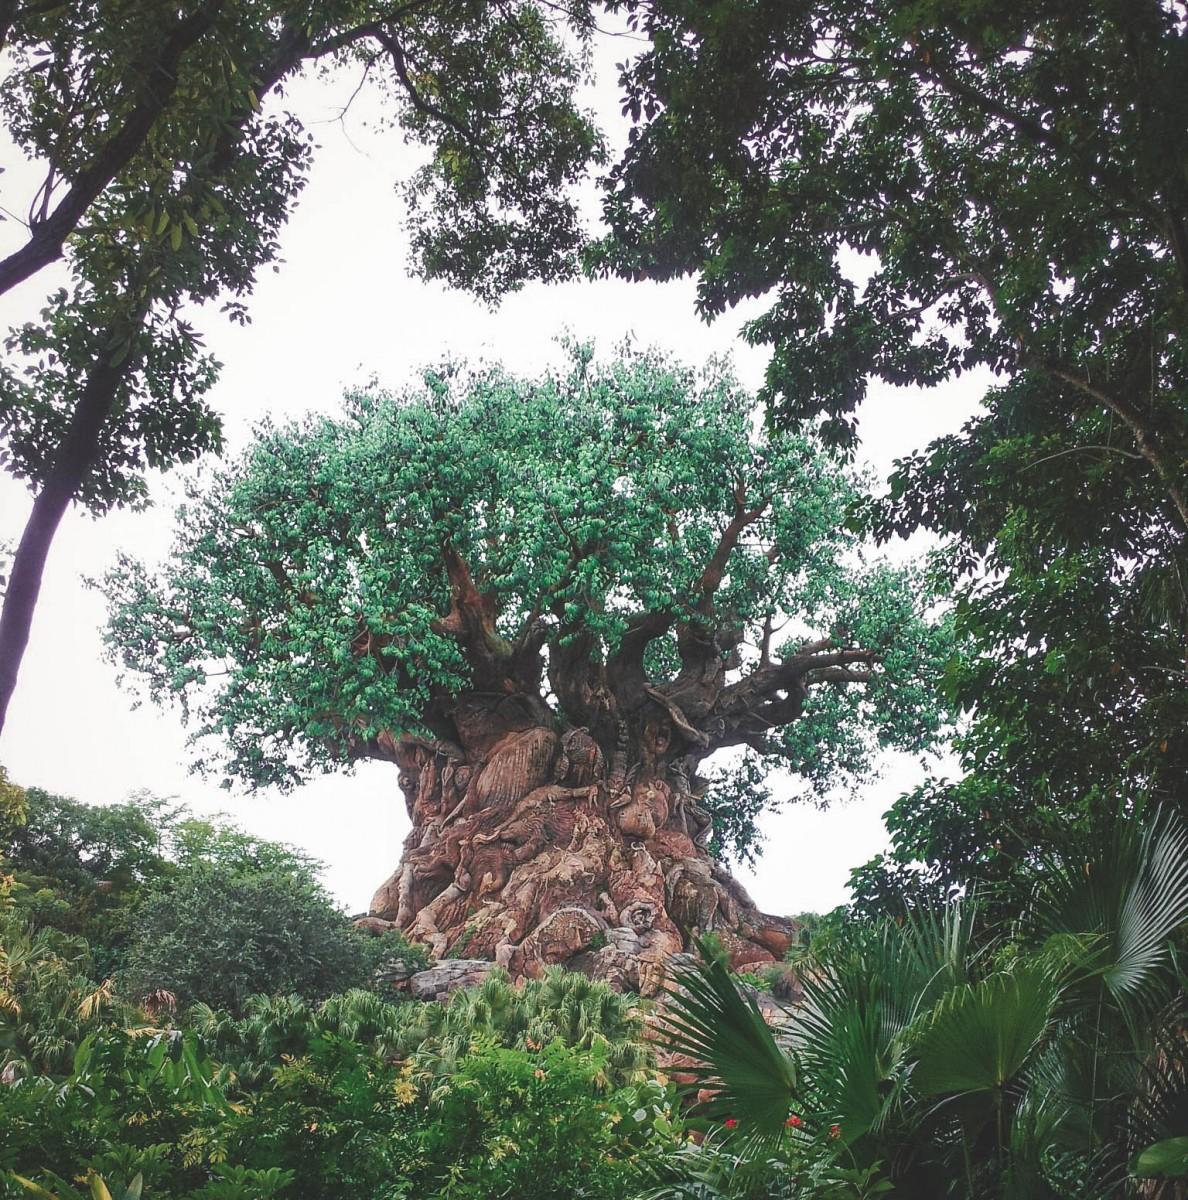 Tree Of Life sculpture in Animal Kingdom